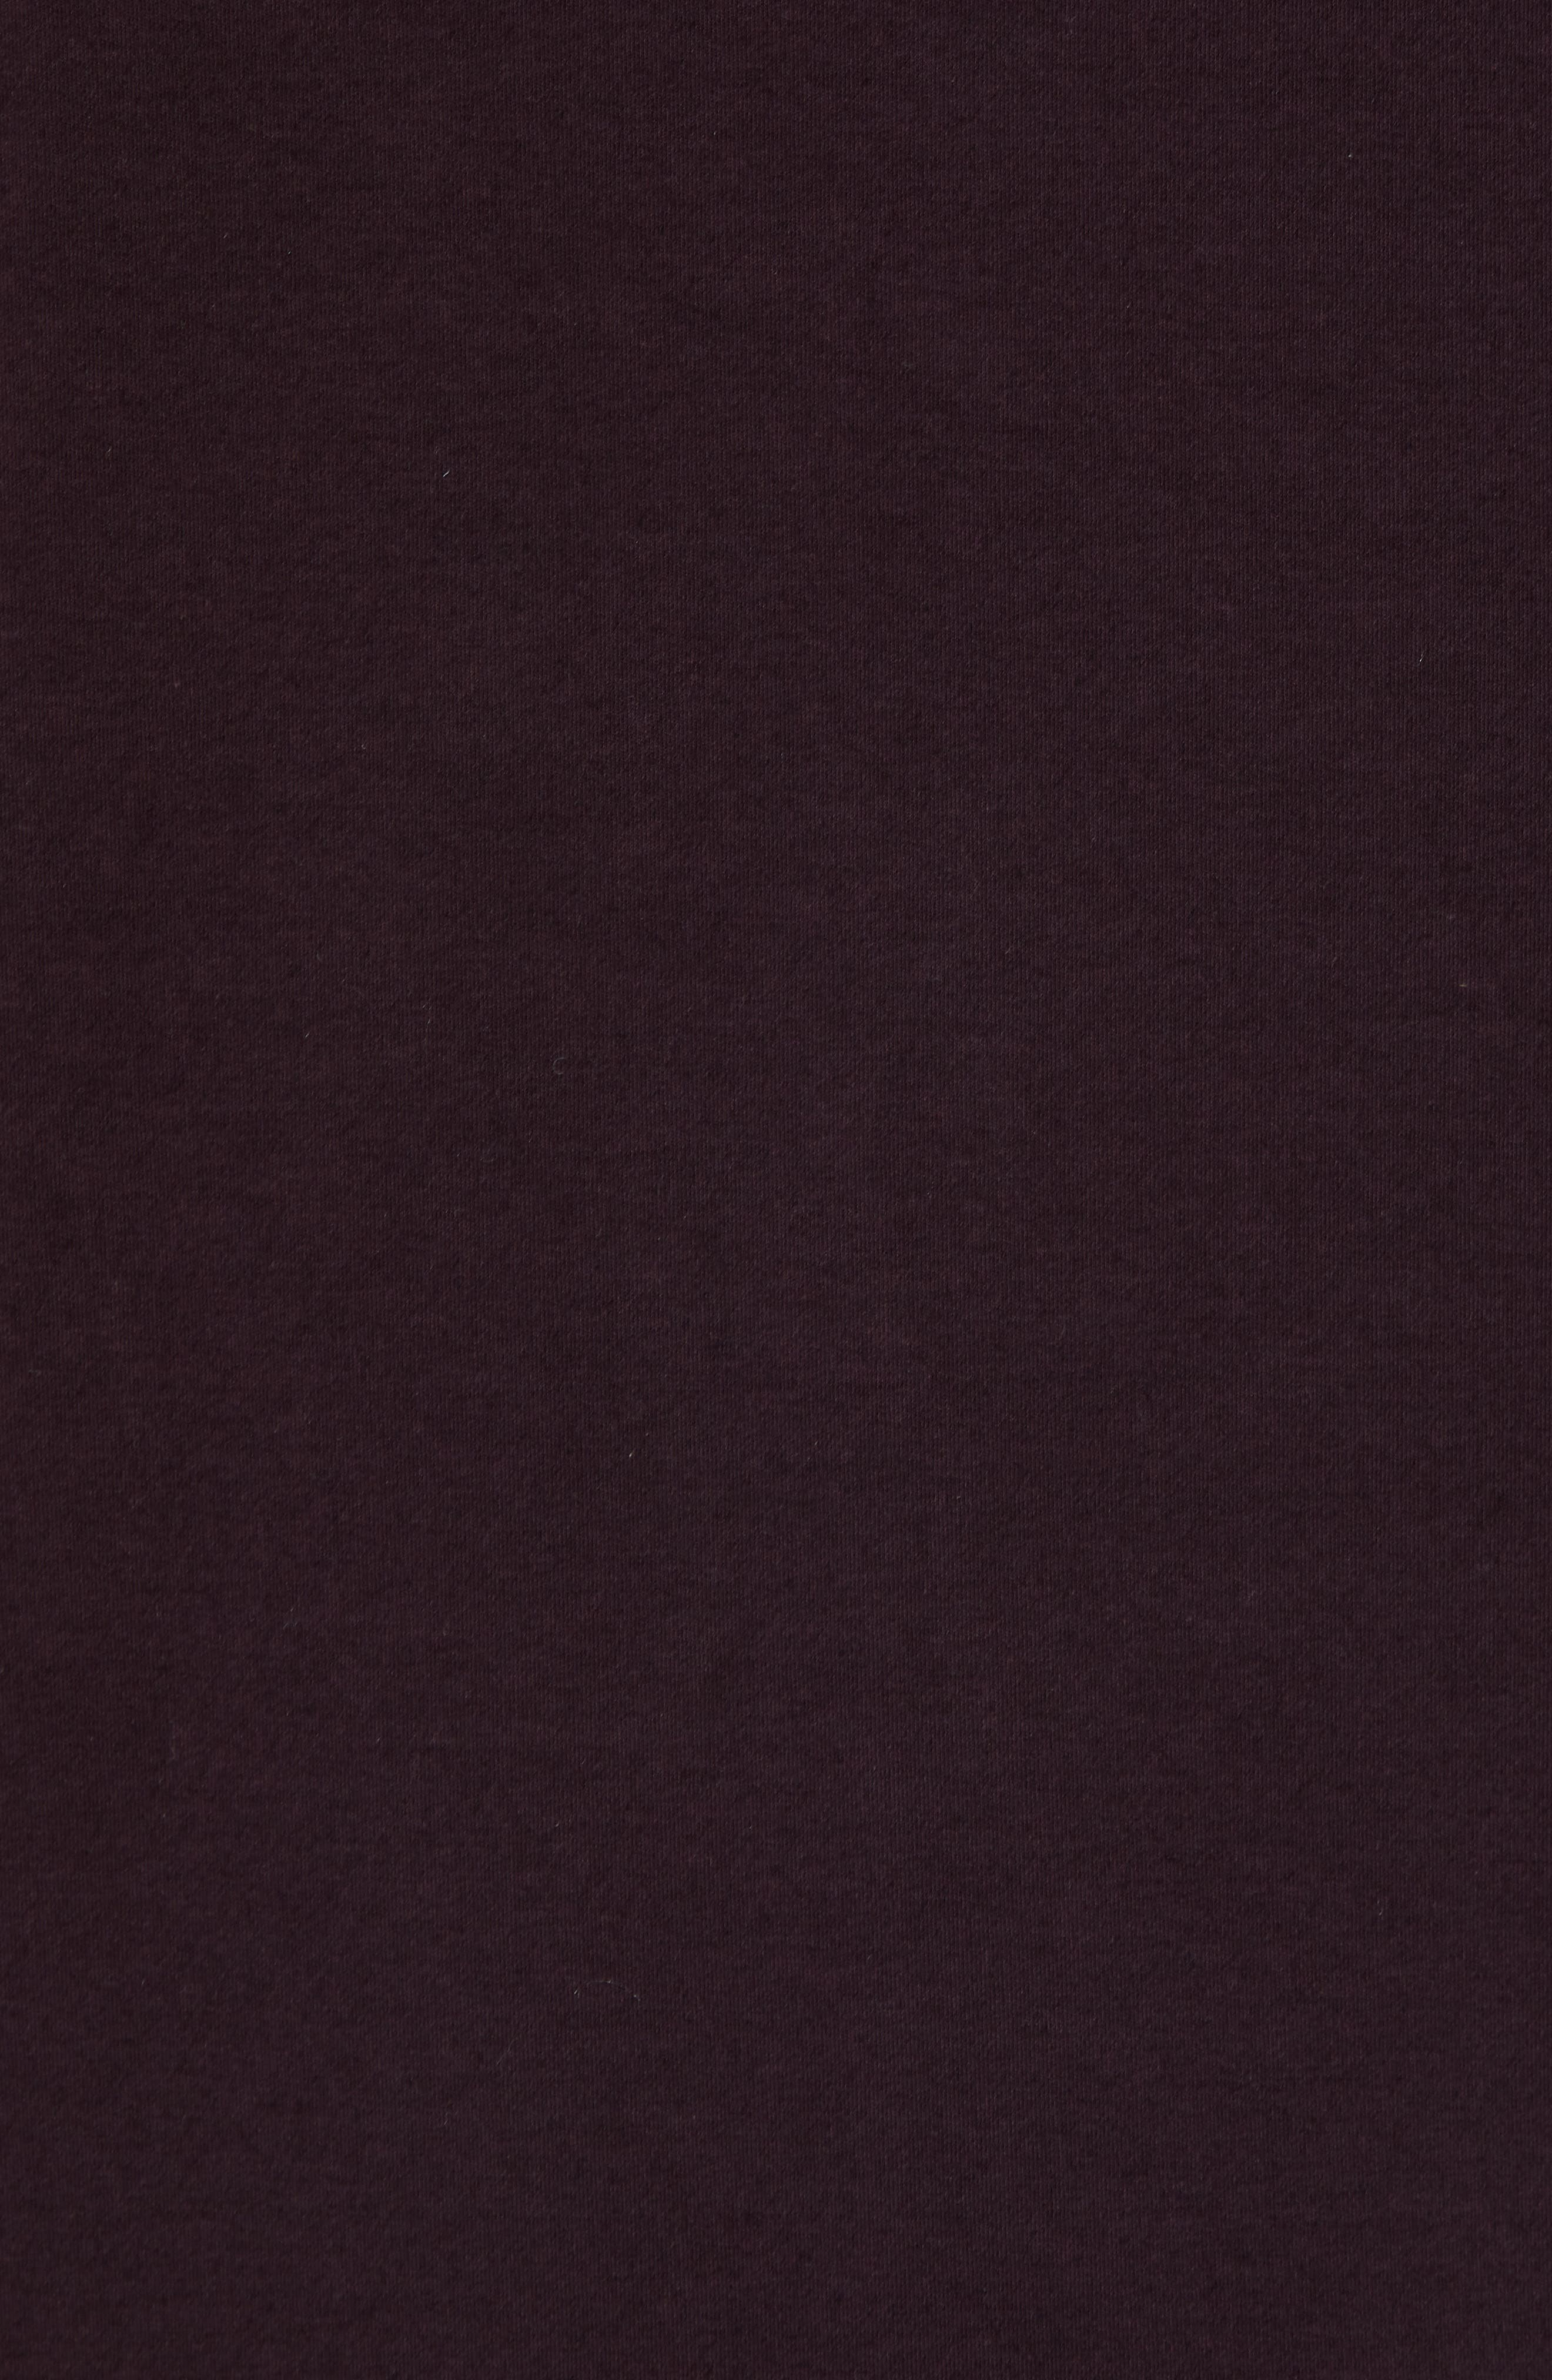 Sportswear Tech Full Zip Hoodie,                             Alternate thumbnail 5, color,                             BLACK/ BLACK